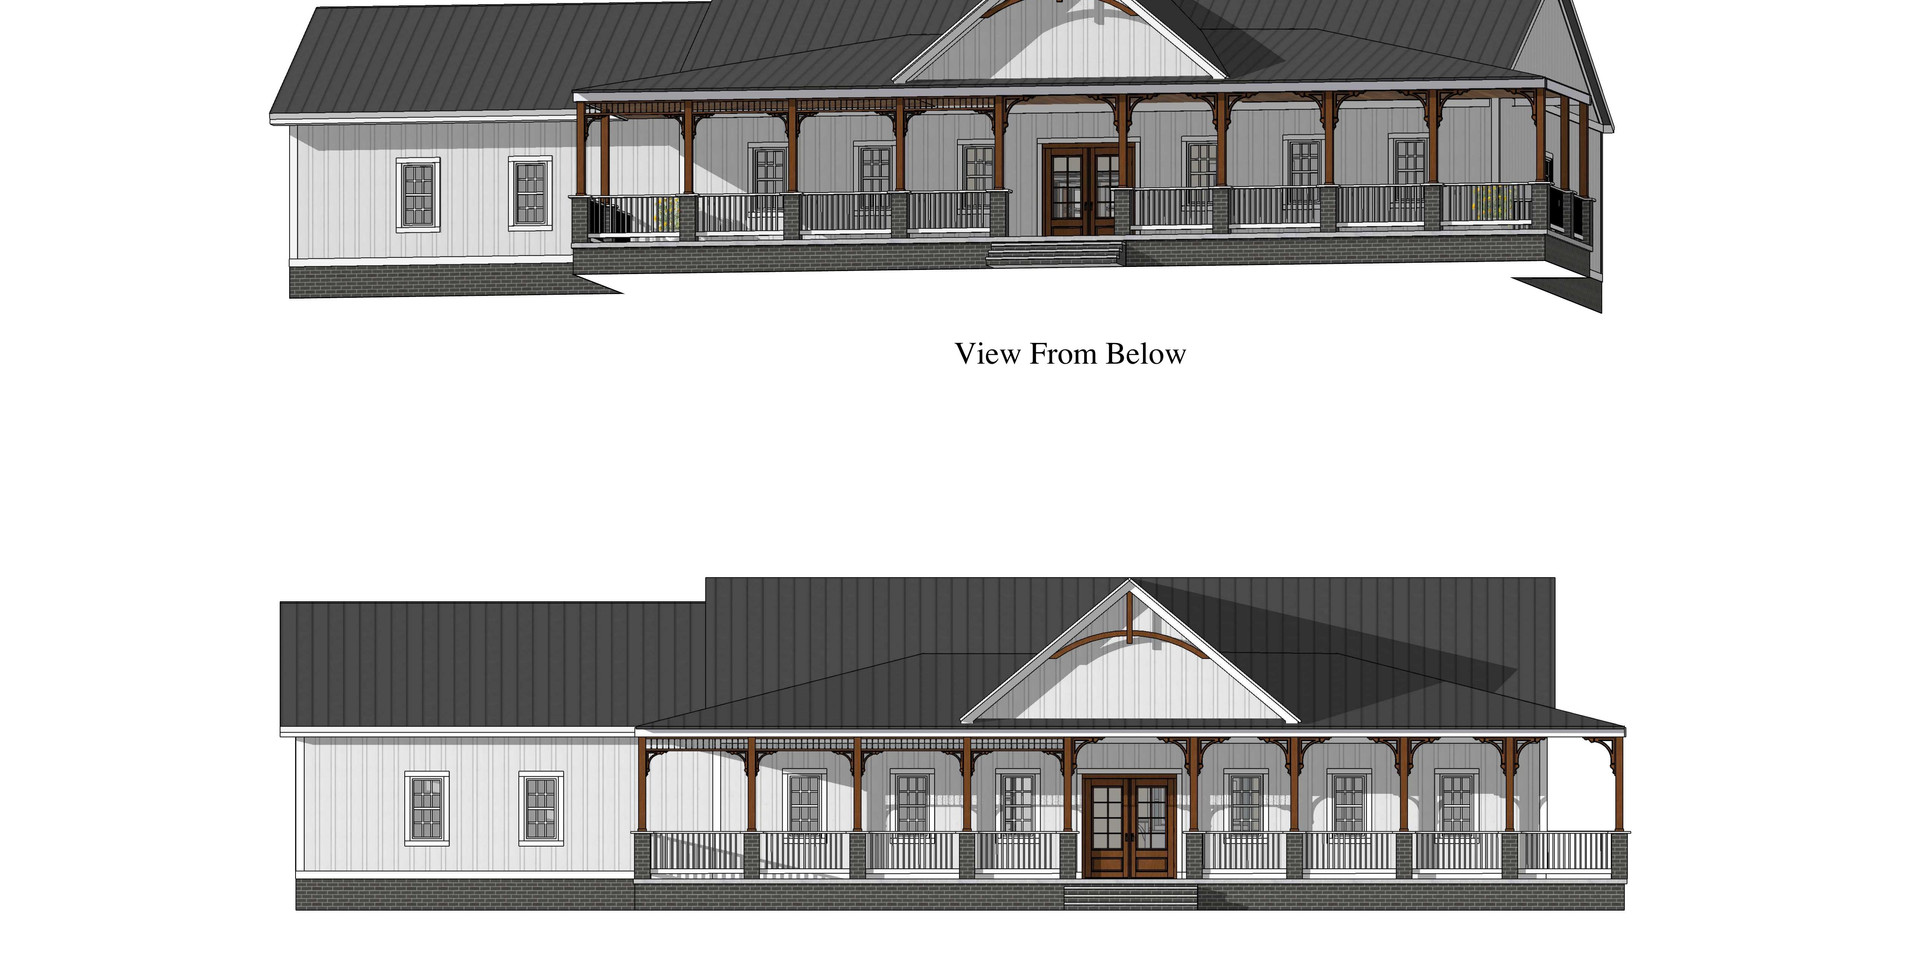 New One-Level Farmhouse 1,600 SF